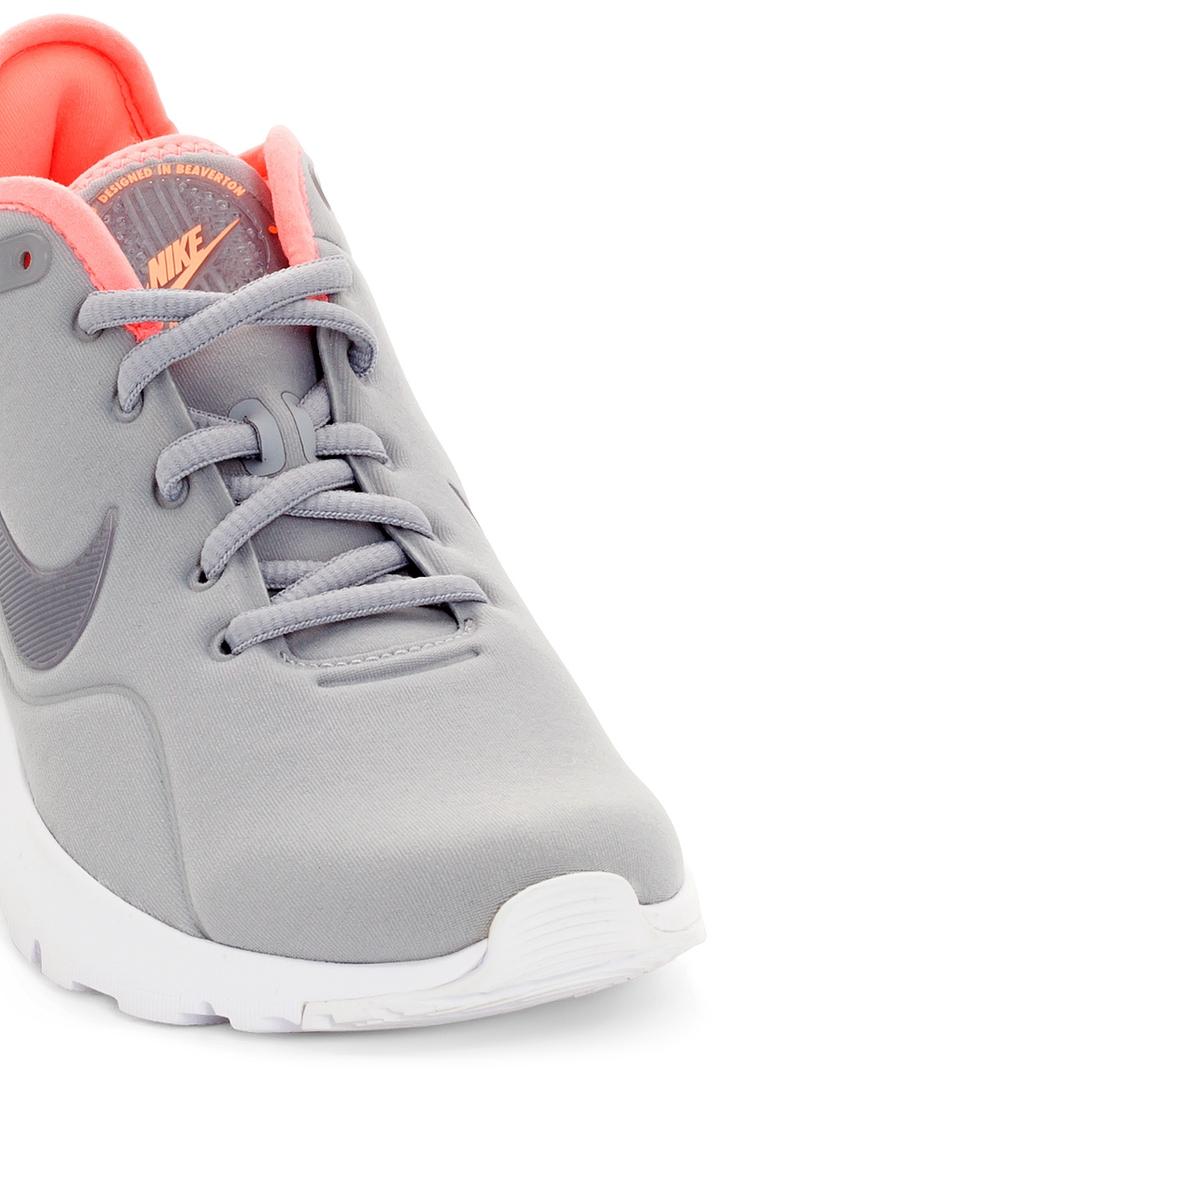 Imagen secundaria de producto de Zapatillas Stargazer Lw - Nike